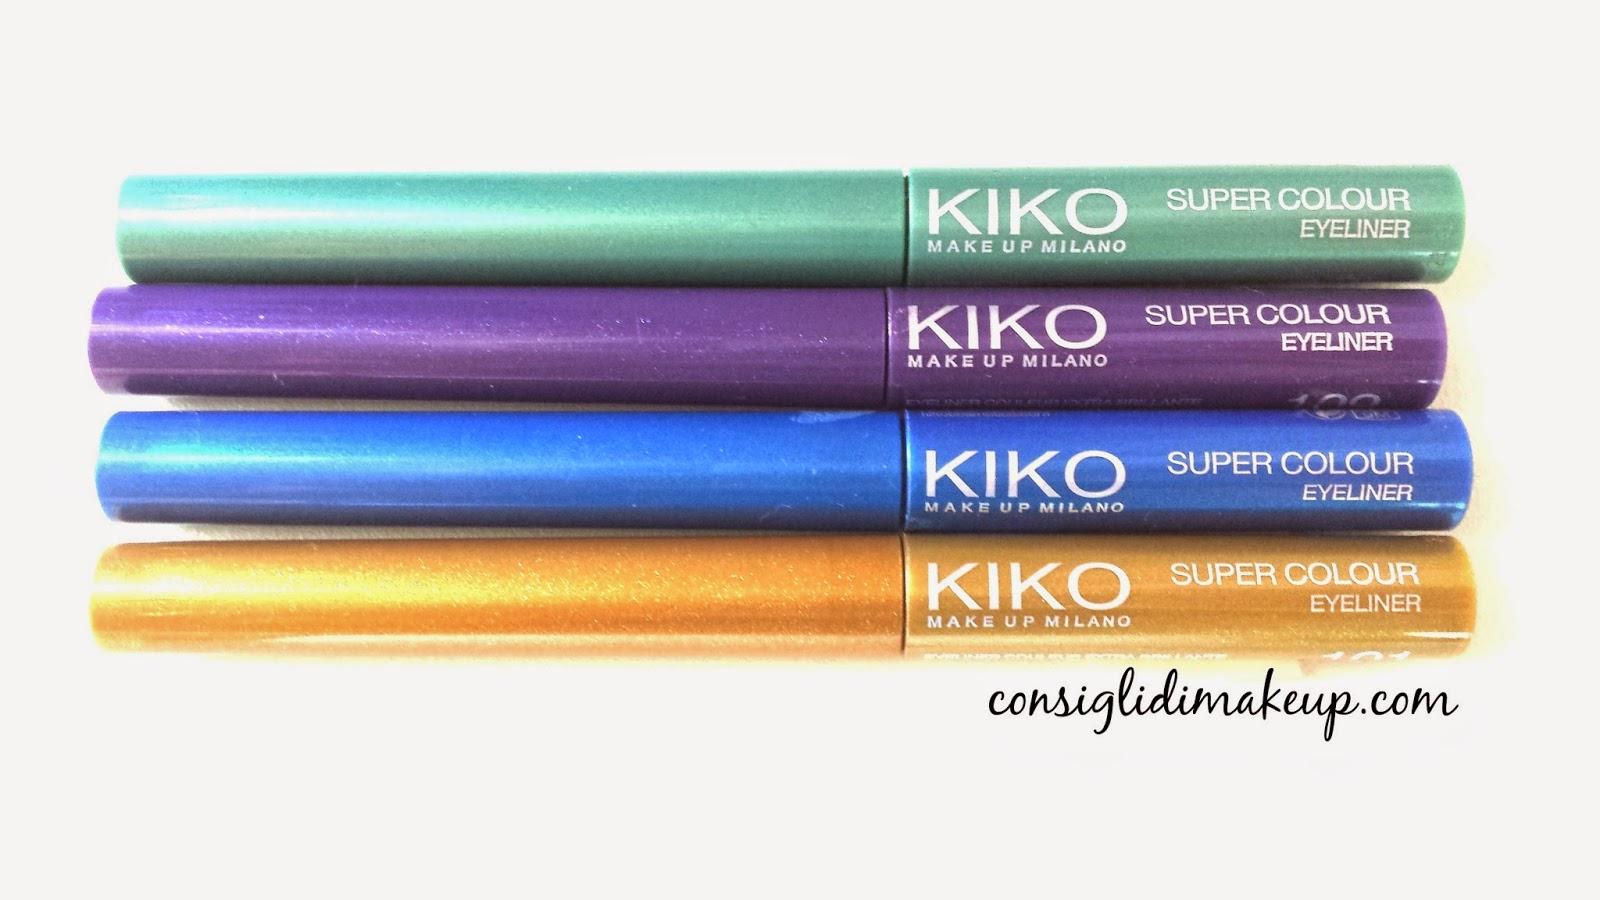 kiko eyeliner colorati super colour review